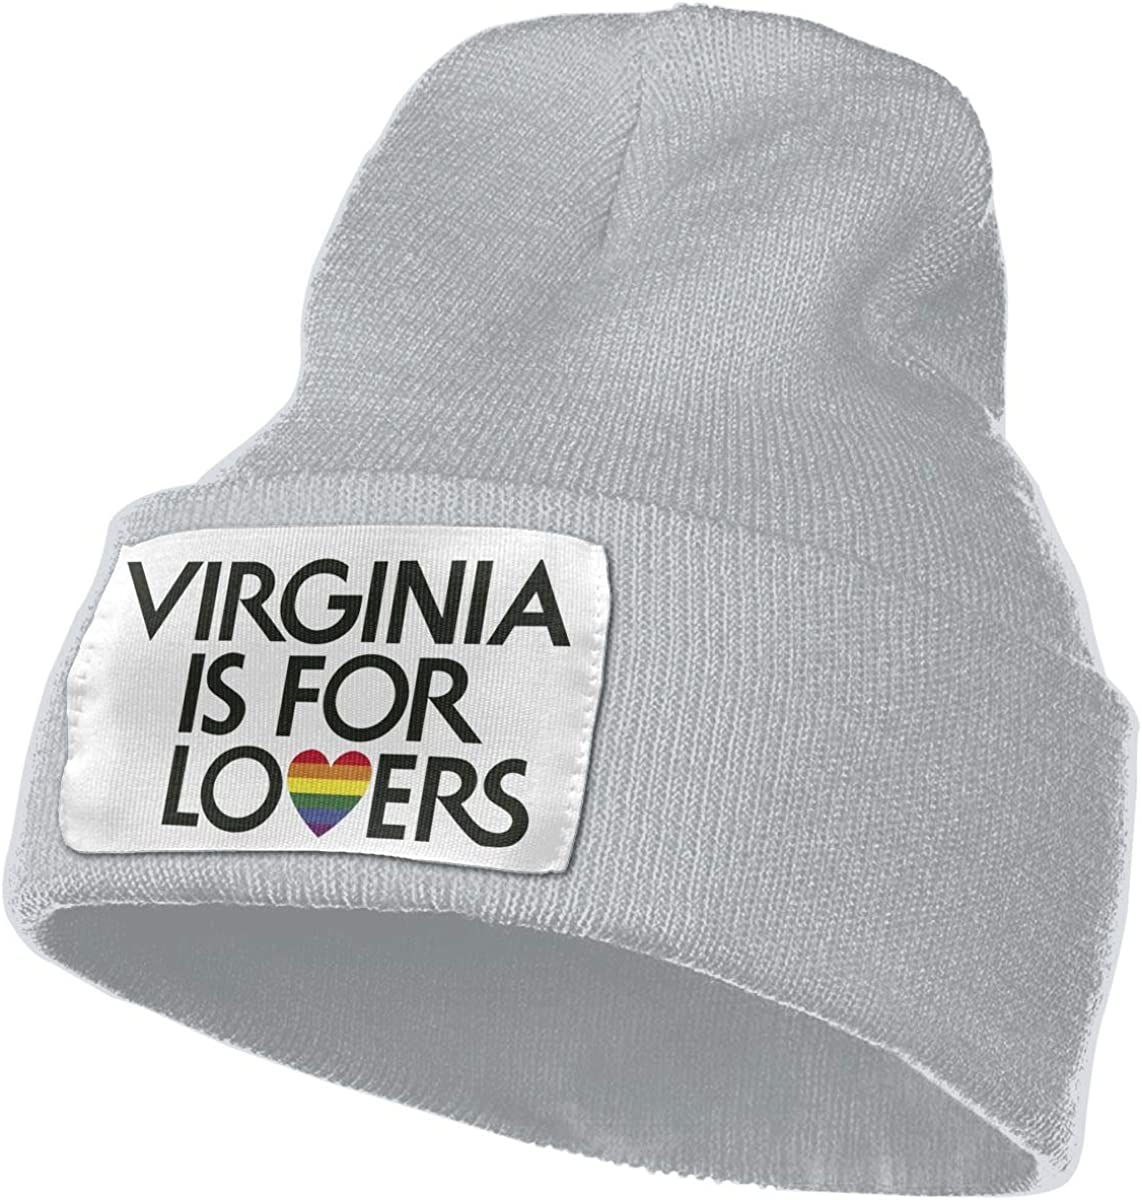 Virginia is for Lovers Gay Flag Men/&Women Warm Winter Knit Plain Beanie Hat Skull Cap Acrylic Knit Cuff Hat